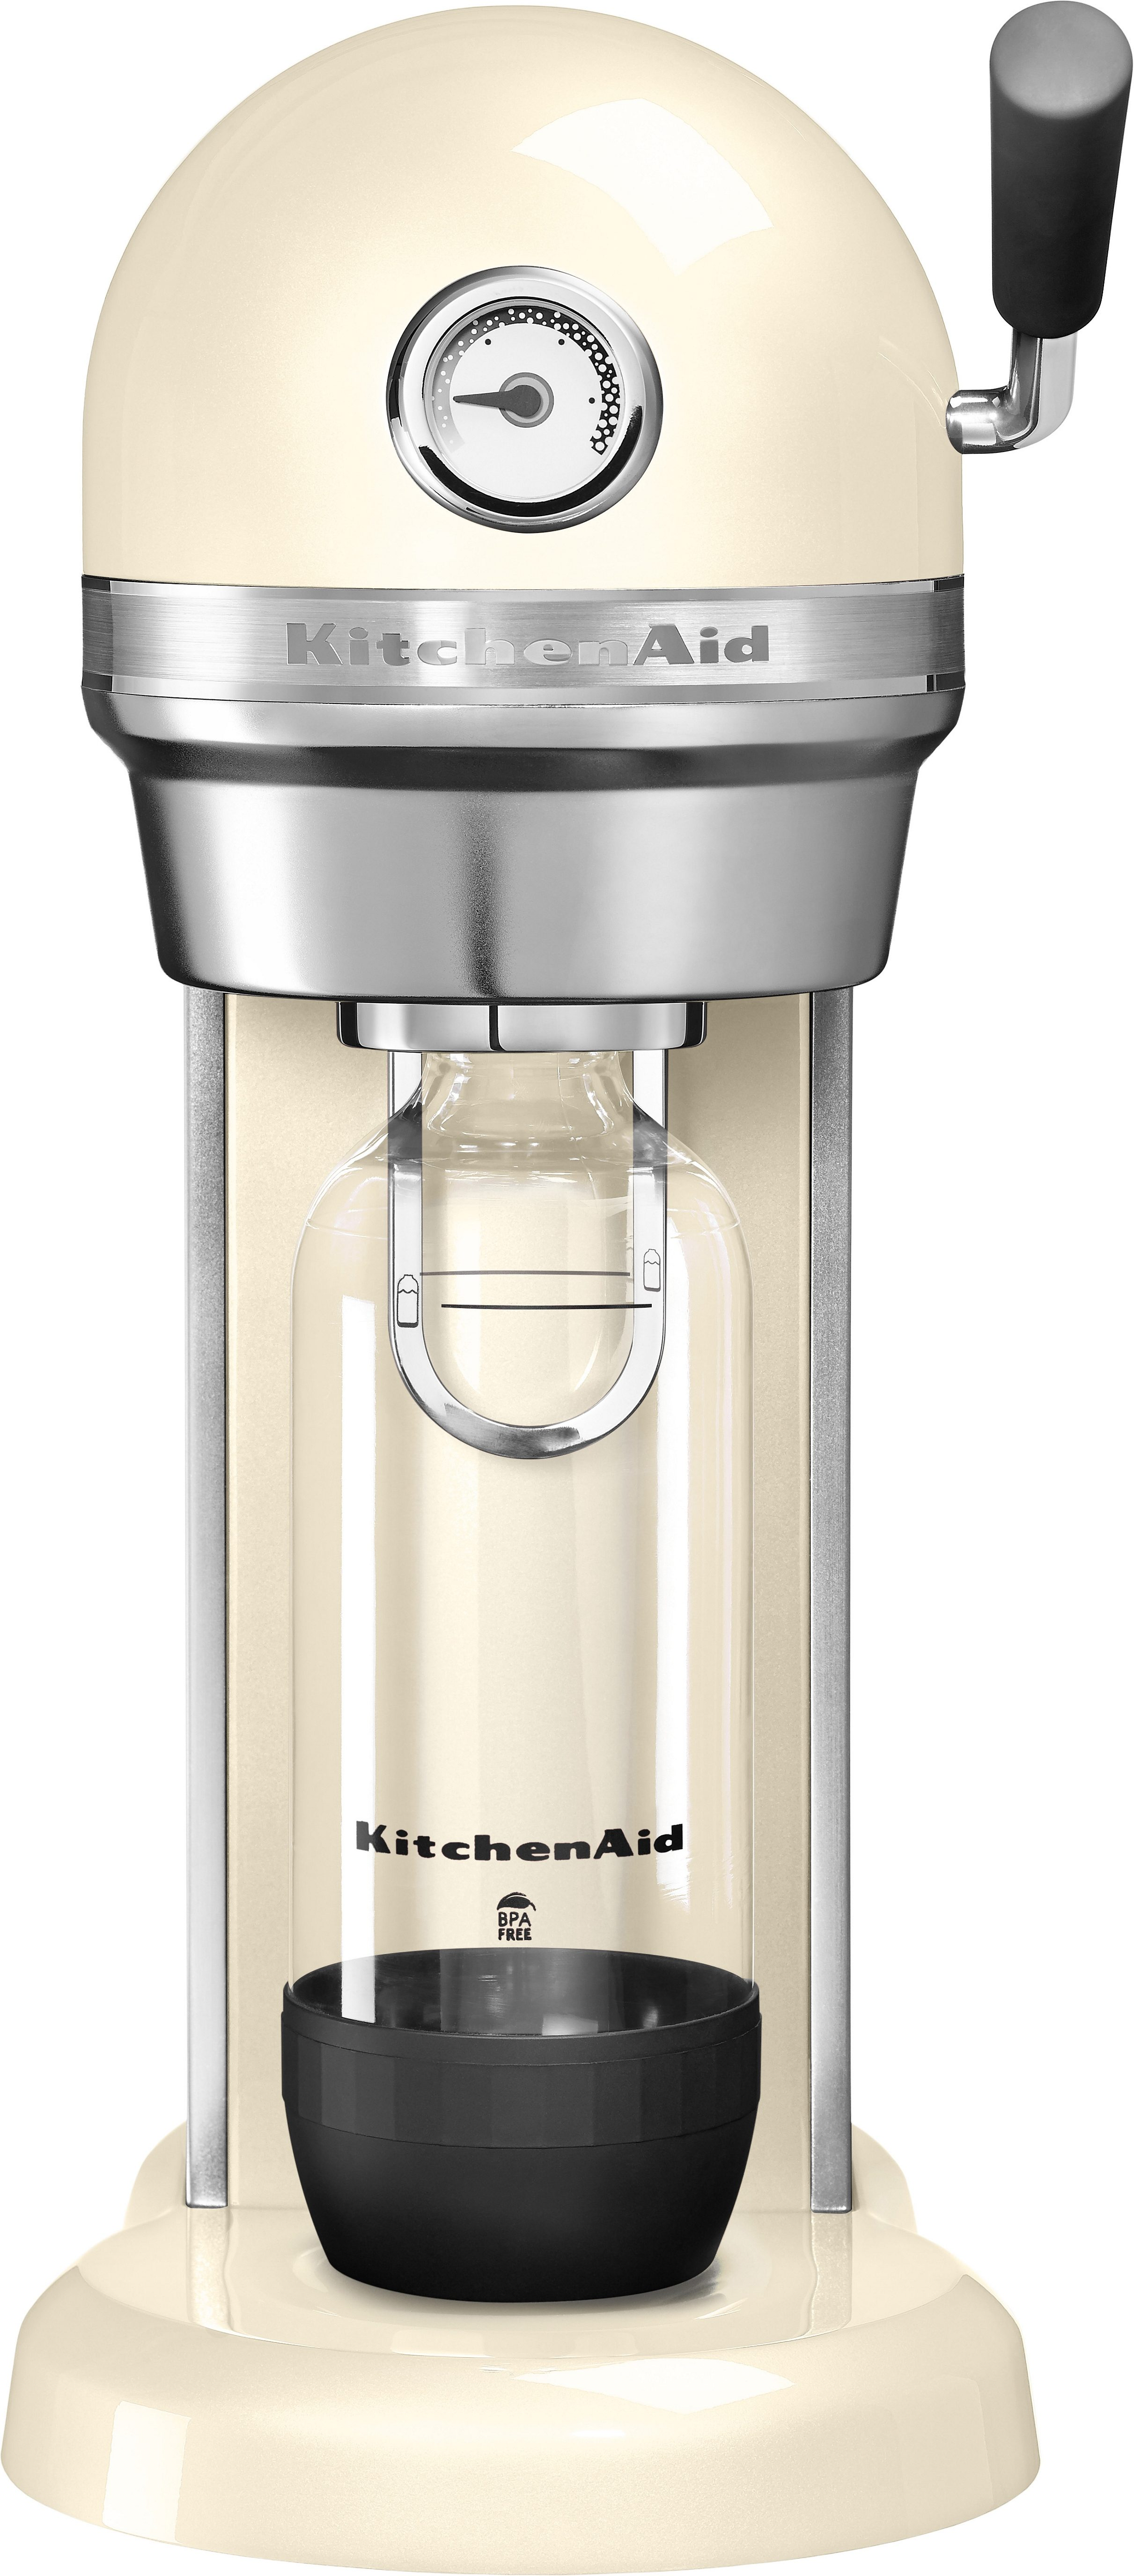 KitchenAid® Artisan Soda Stream 5KSS1121AC crème